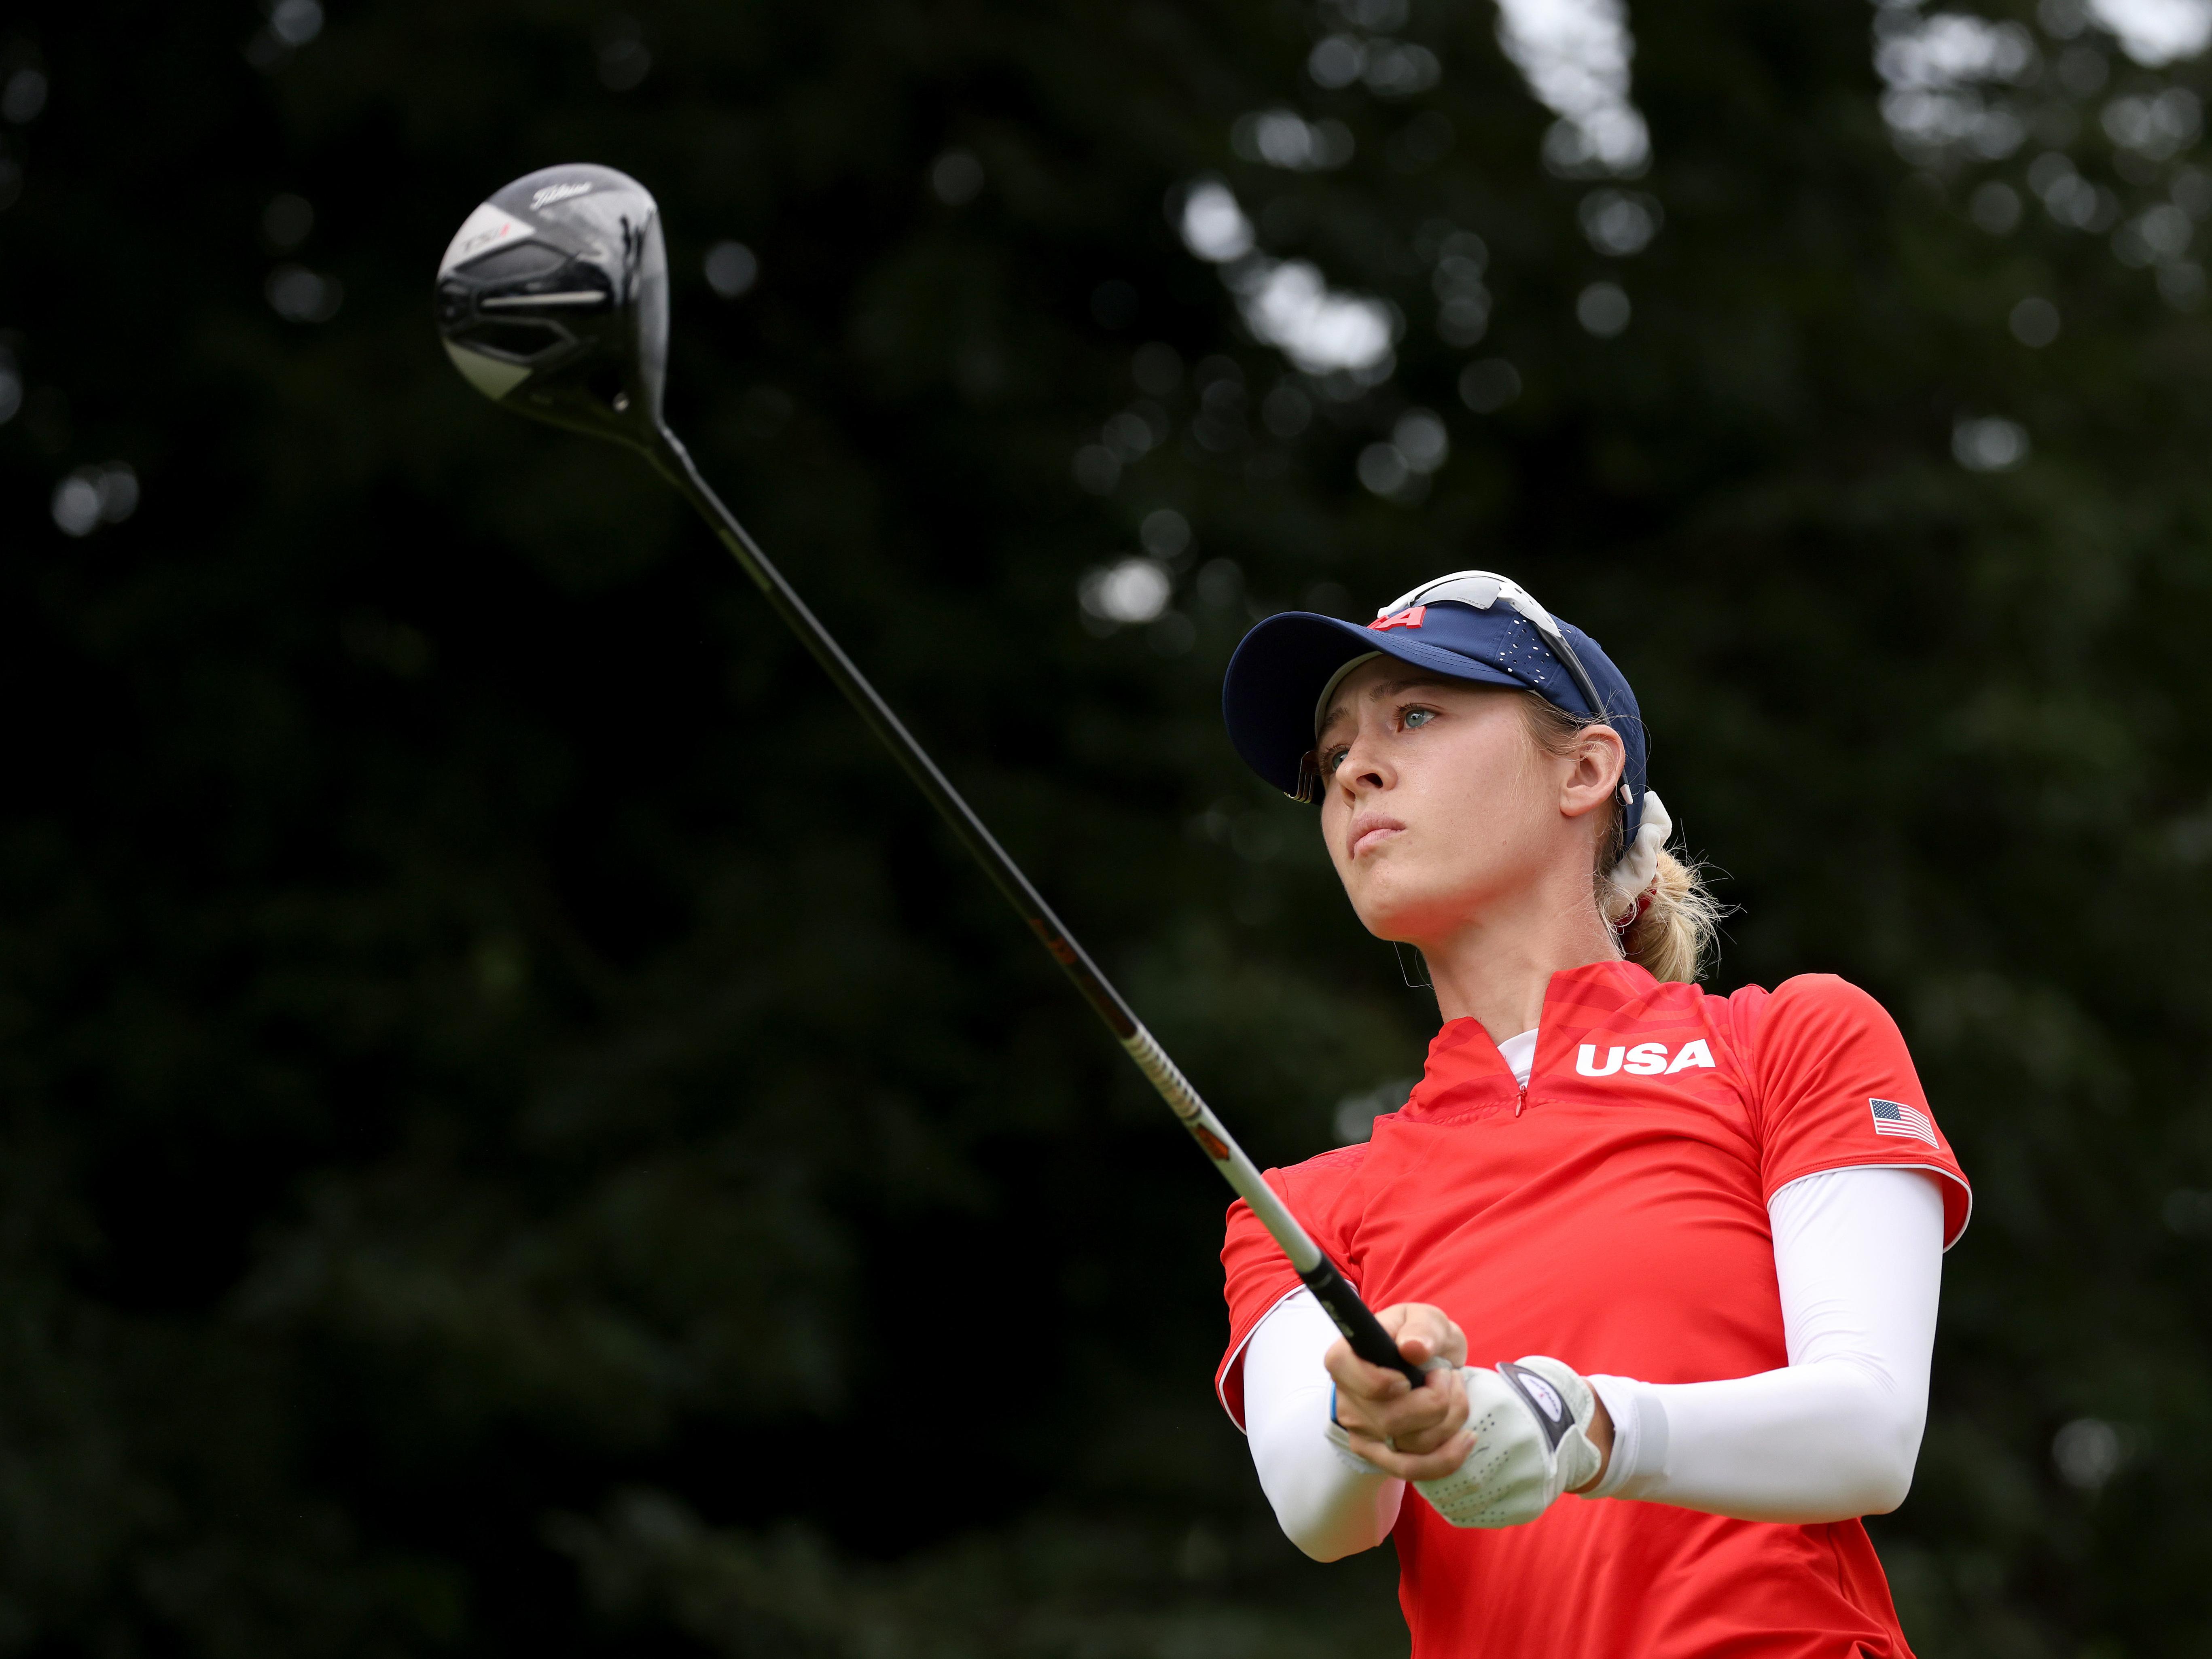 U S Golfer Nelly Korda Wins Olympic Gold Live Updates The Tokyo Olympics Npr